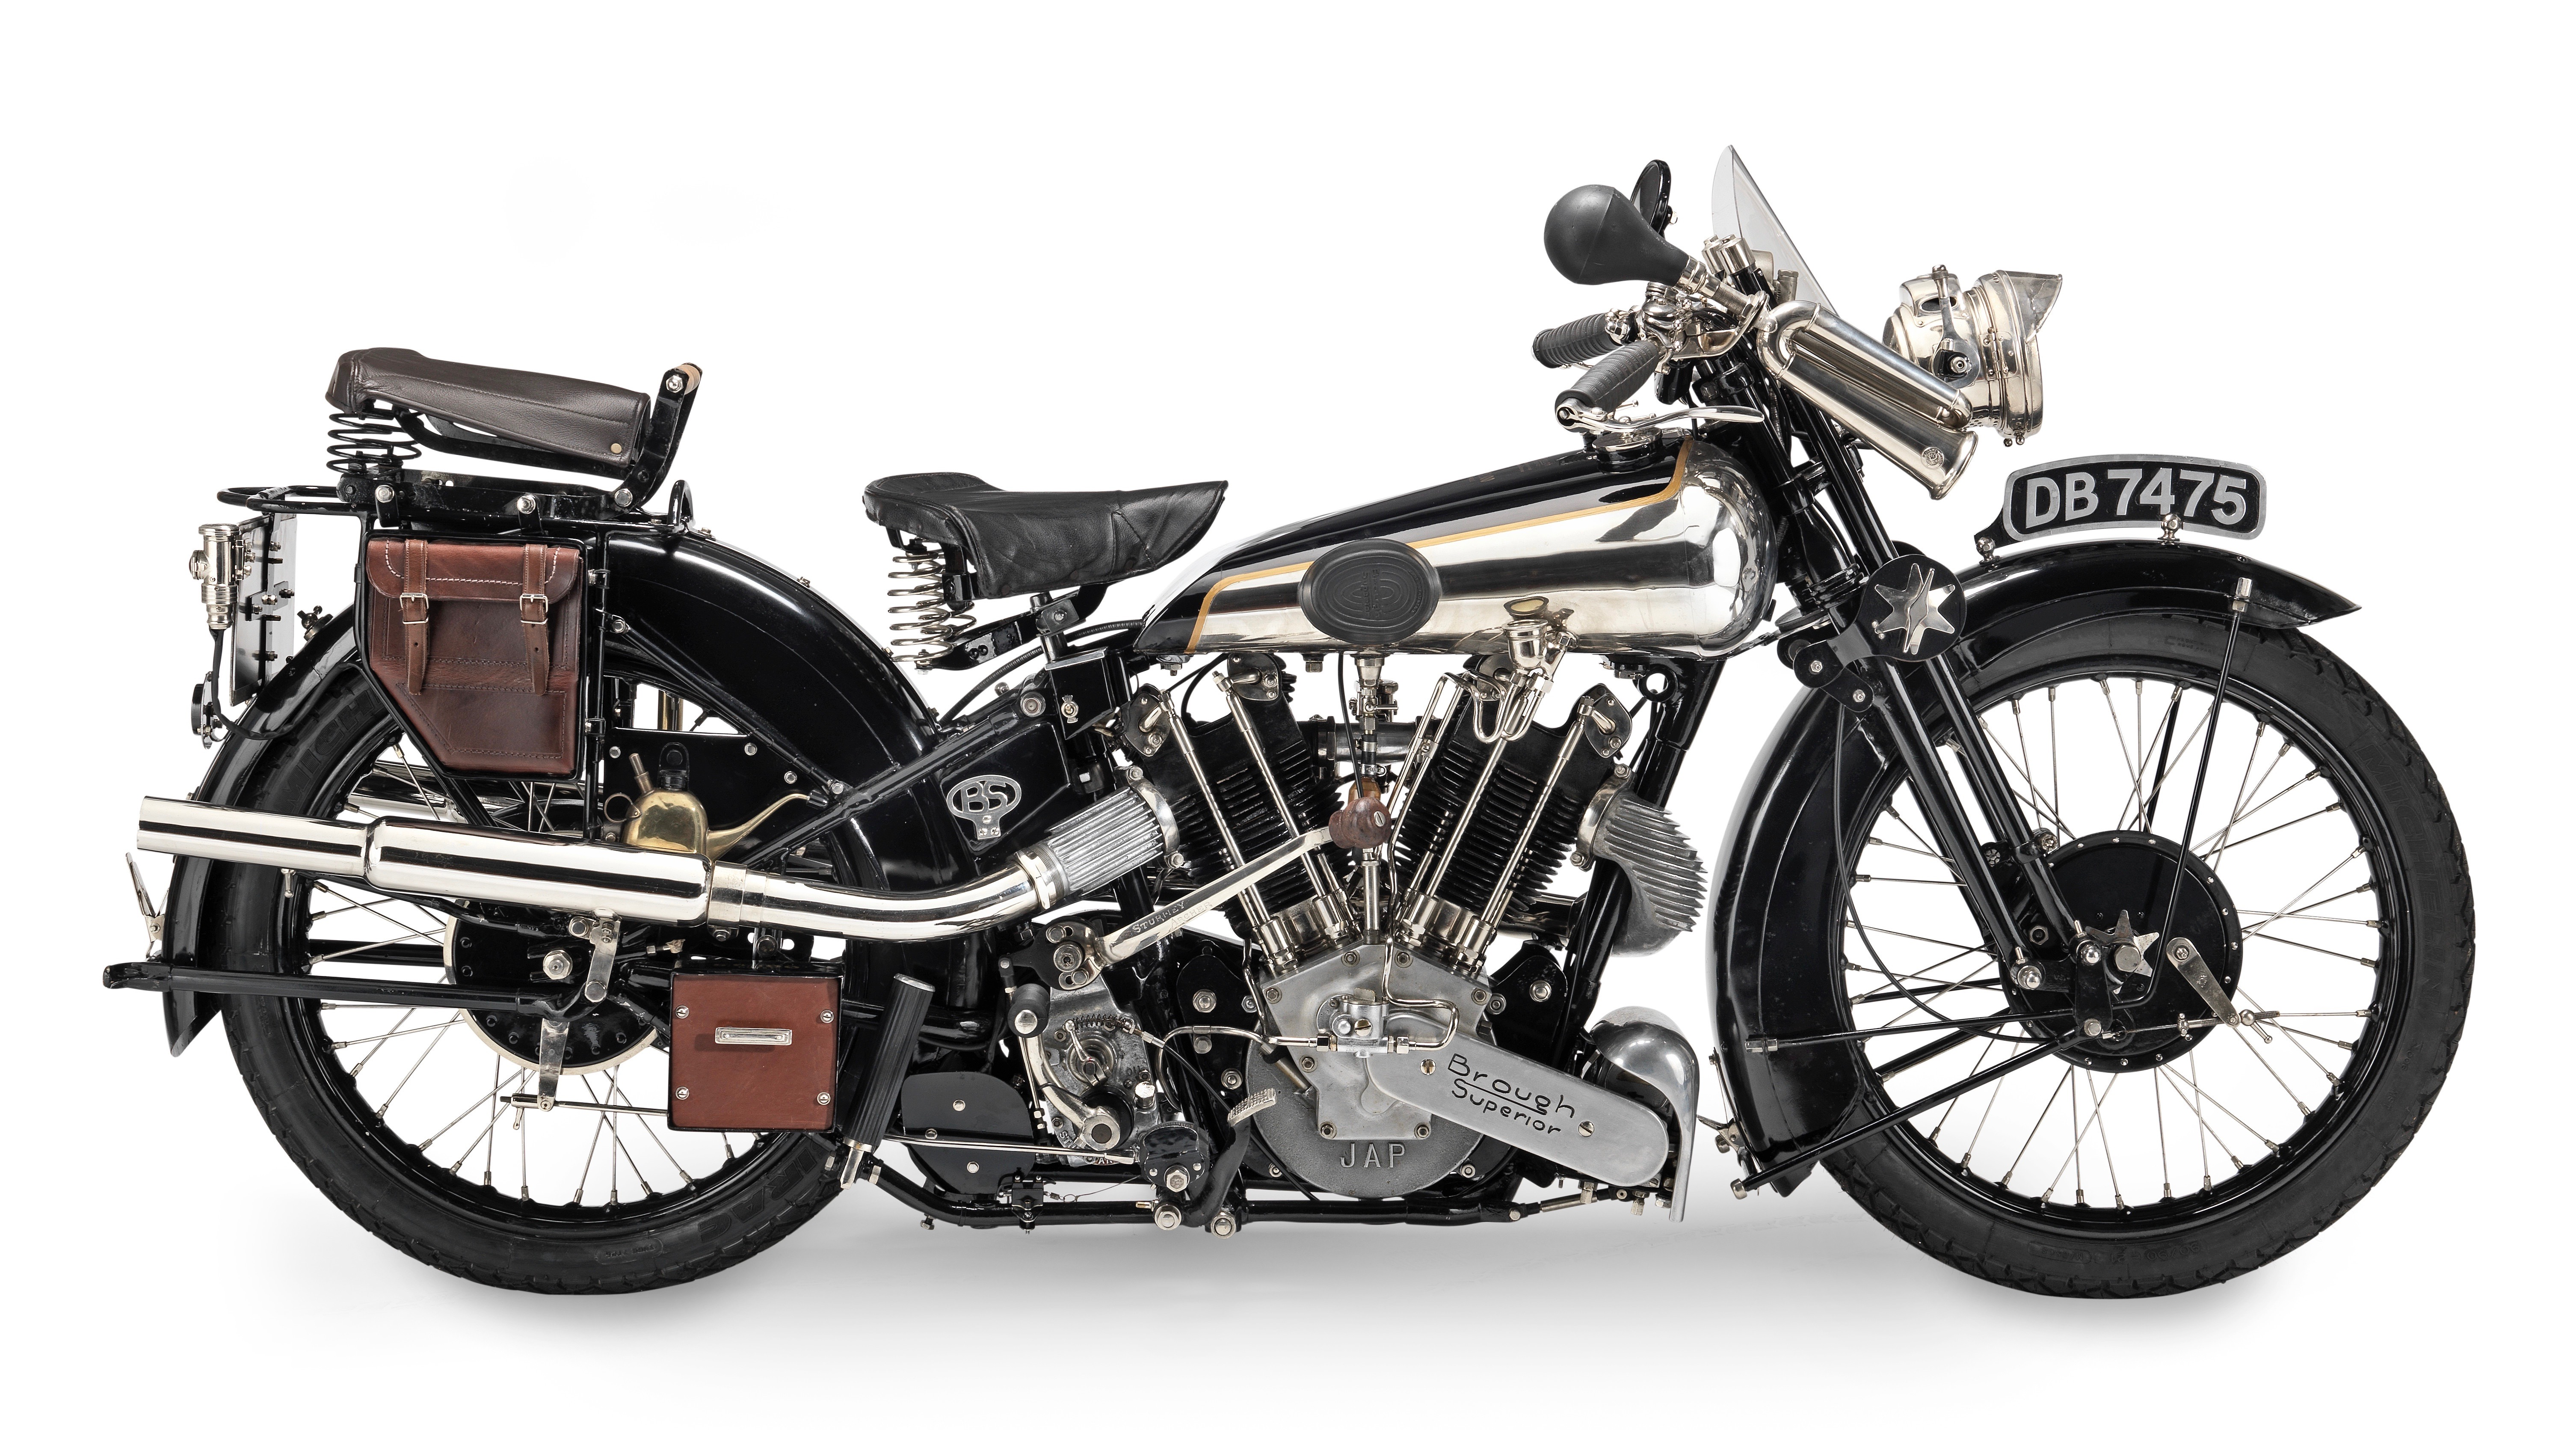 Motorcycle, Records fall at Bonhams' bike sale, ClassicCars.com Journal